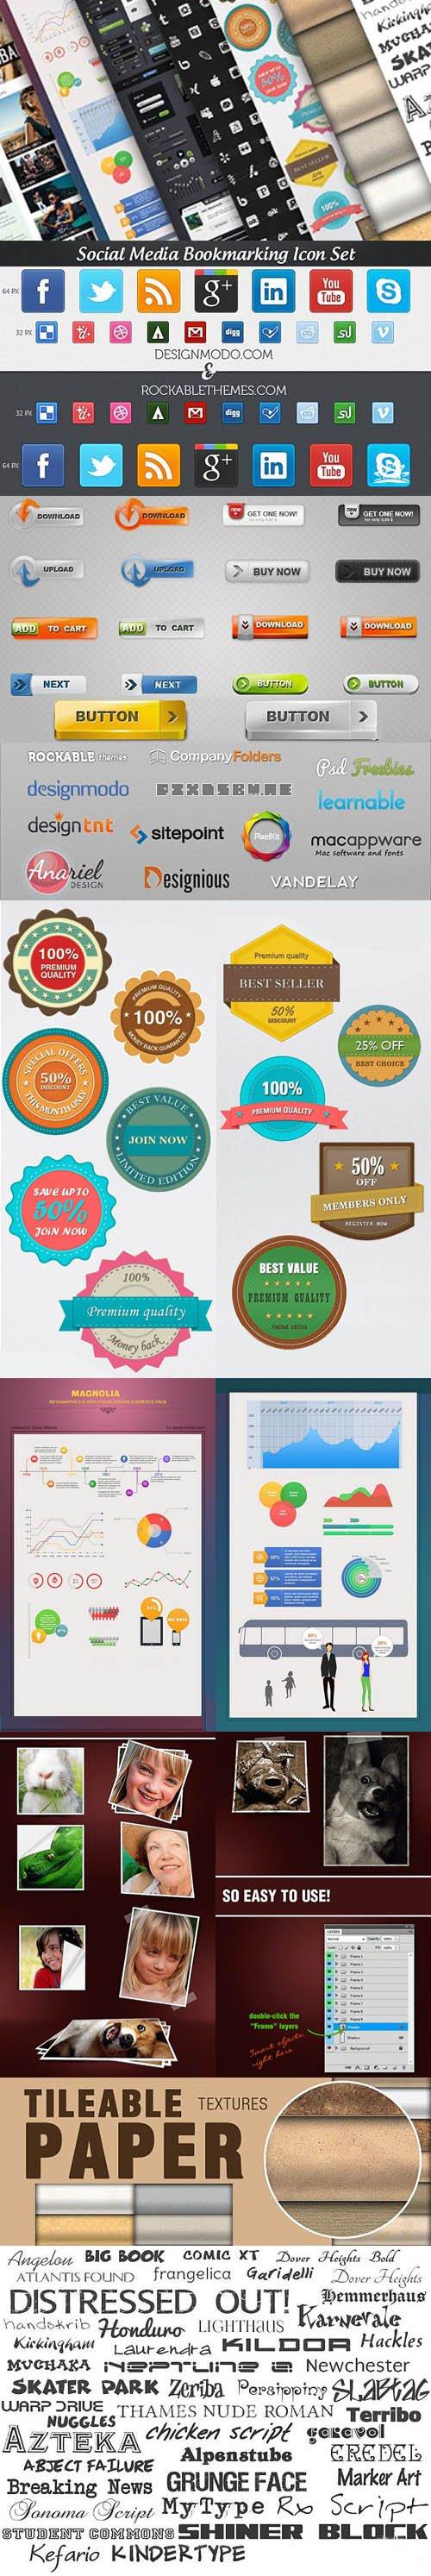 InkyDeals - Web Design Bundle: 471 Premium Design Resources